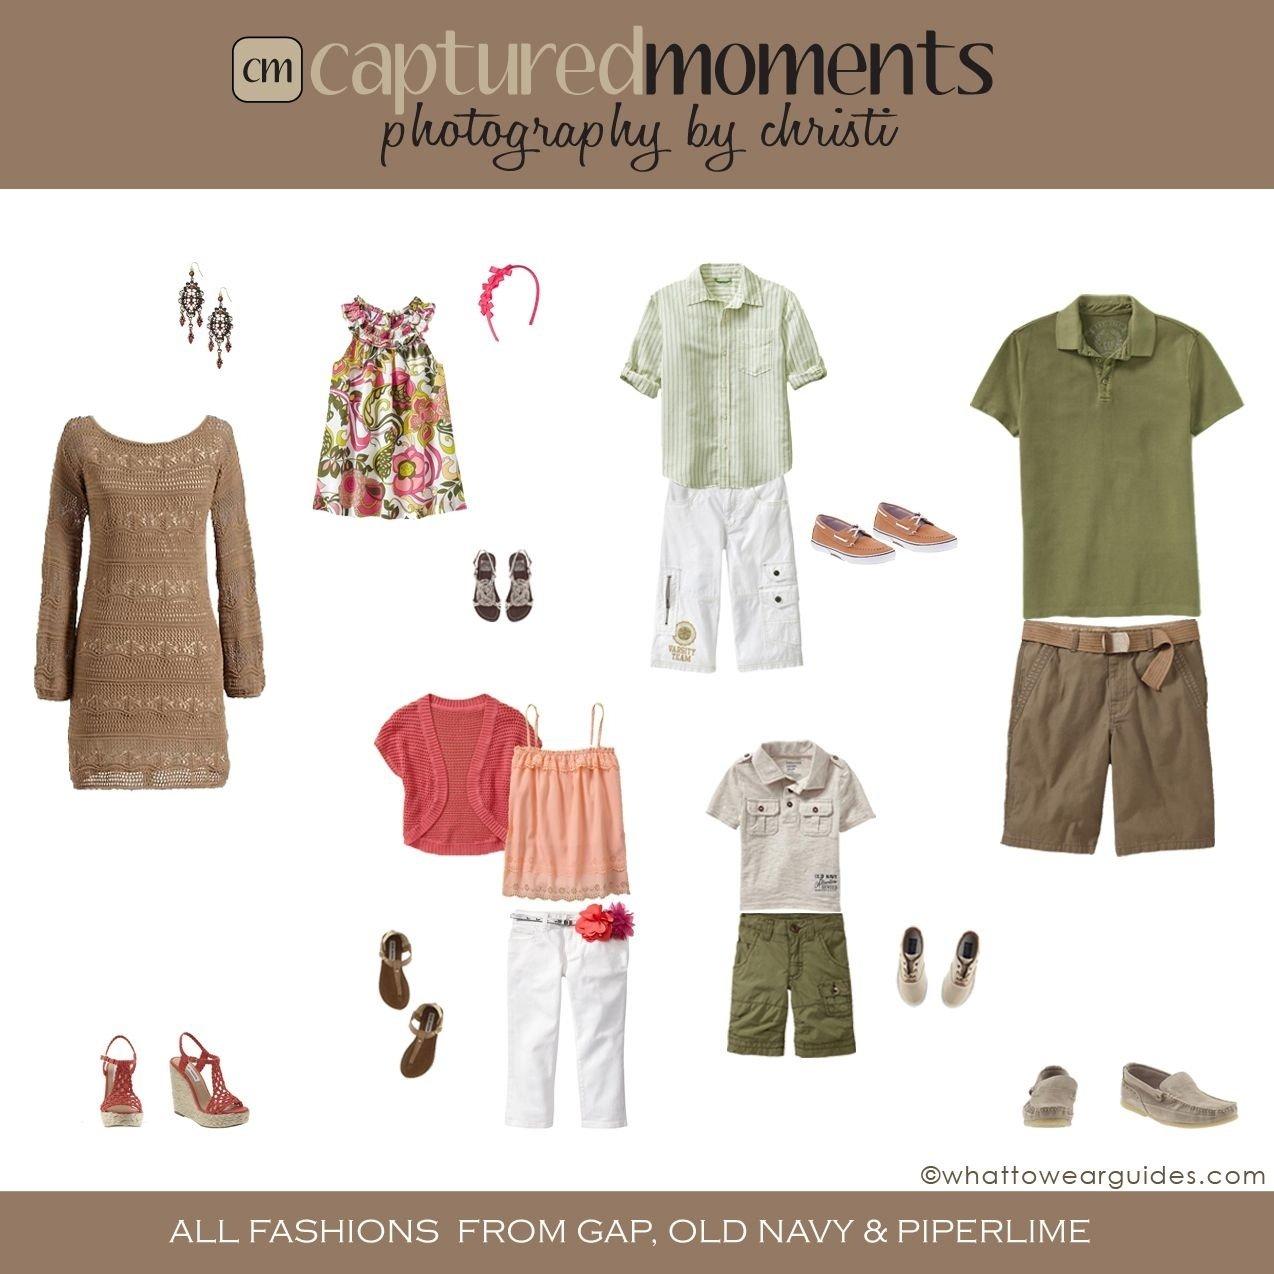 10 Cute Summer Family Photo Clothing Ideas spring family photo outfit ideas google search family pic ideas 2 2020